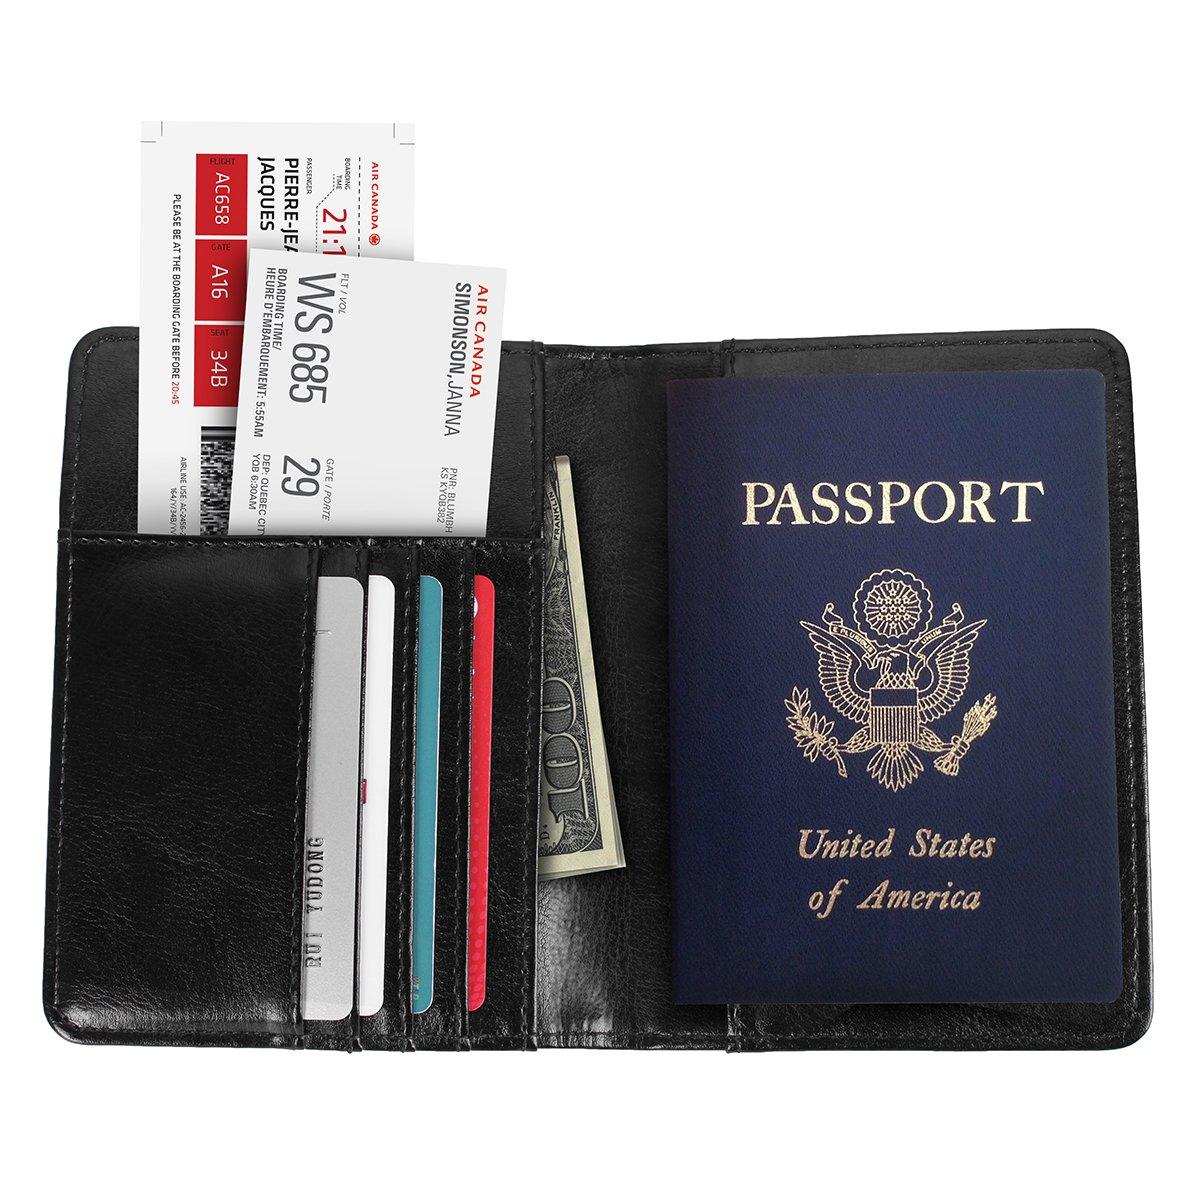 AICase Premium PU Leather Passport Holder FRID Blocking Passport Holder